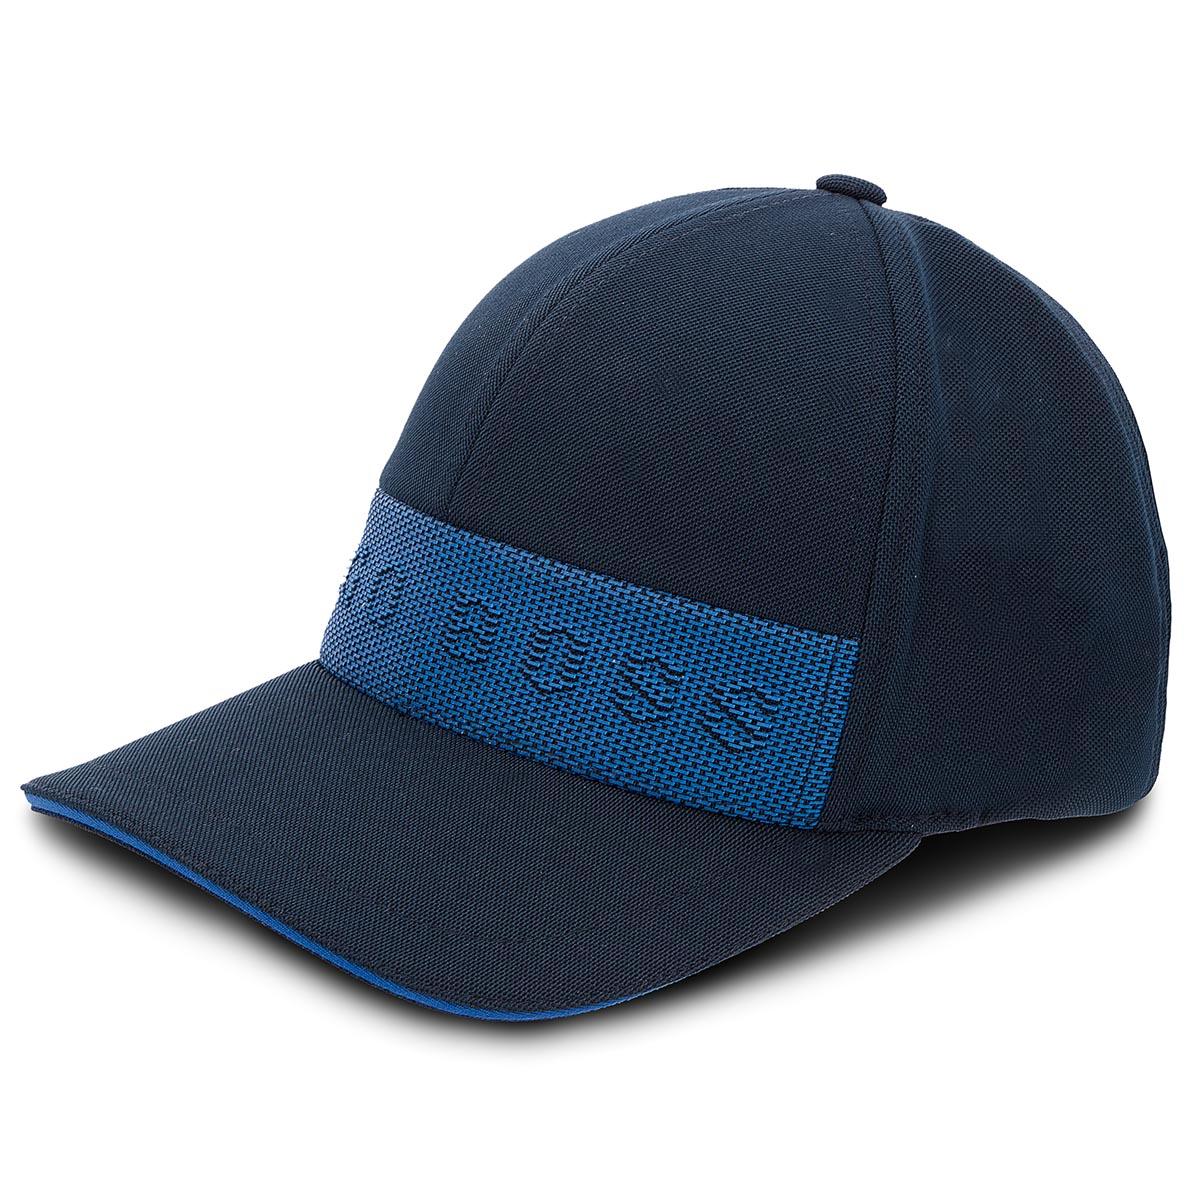 Baseball sapka BOSS - Cap 50382598 410 - Glami.hu 2717a62877